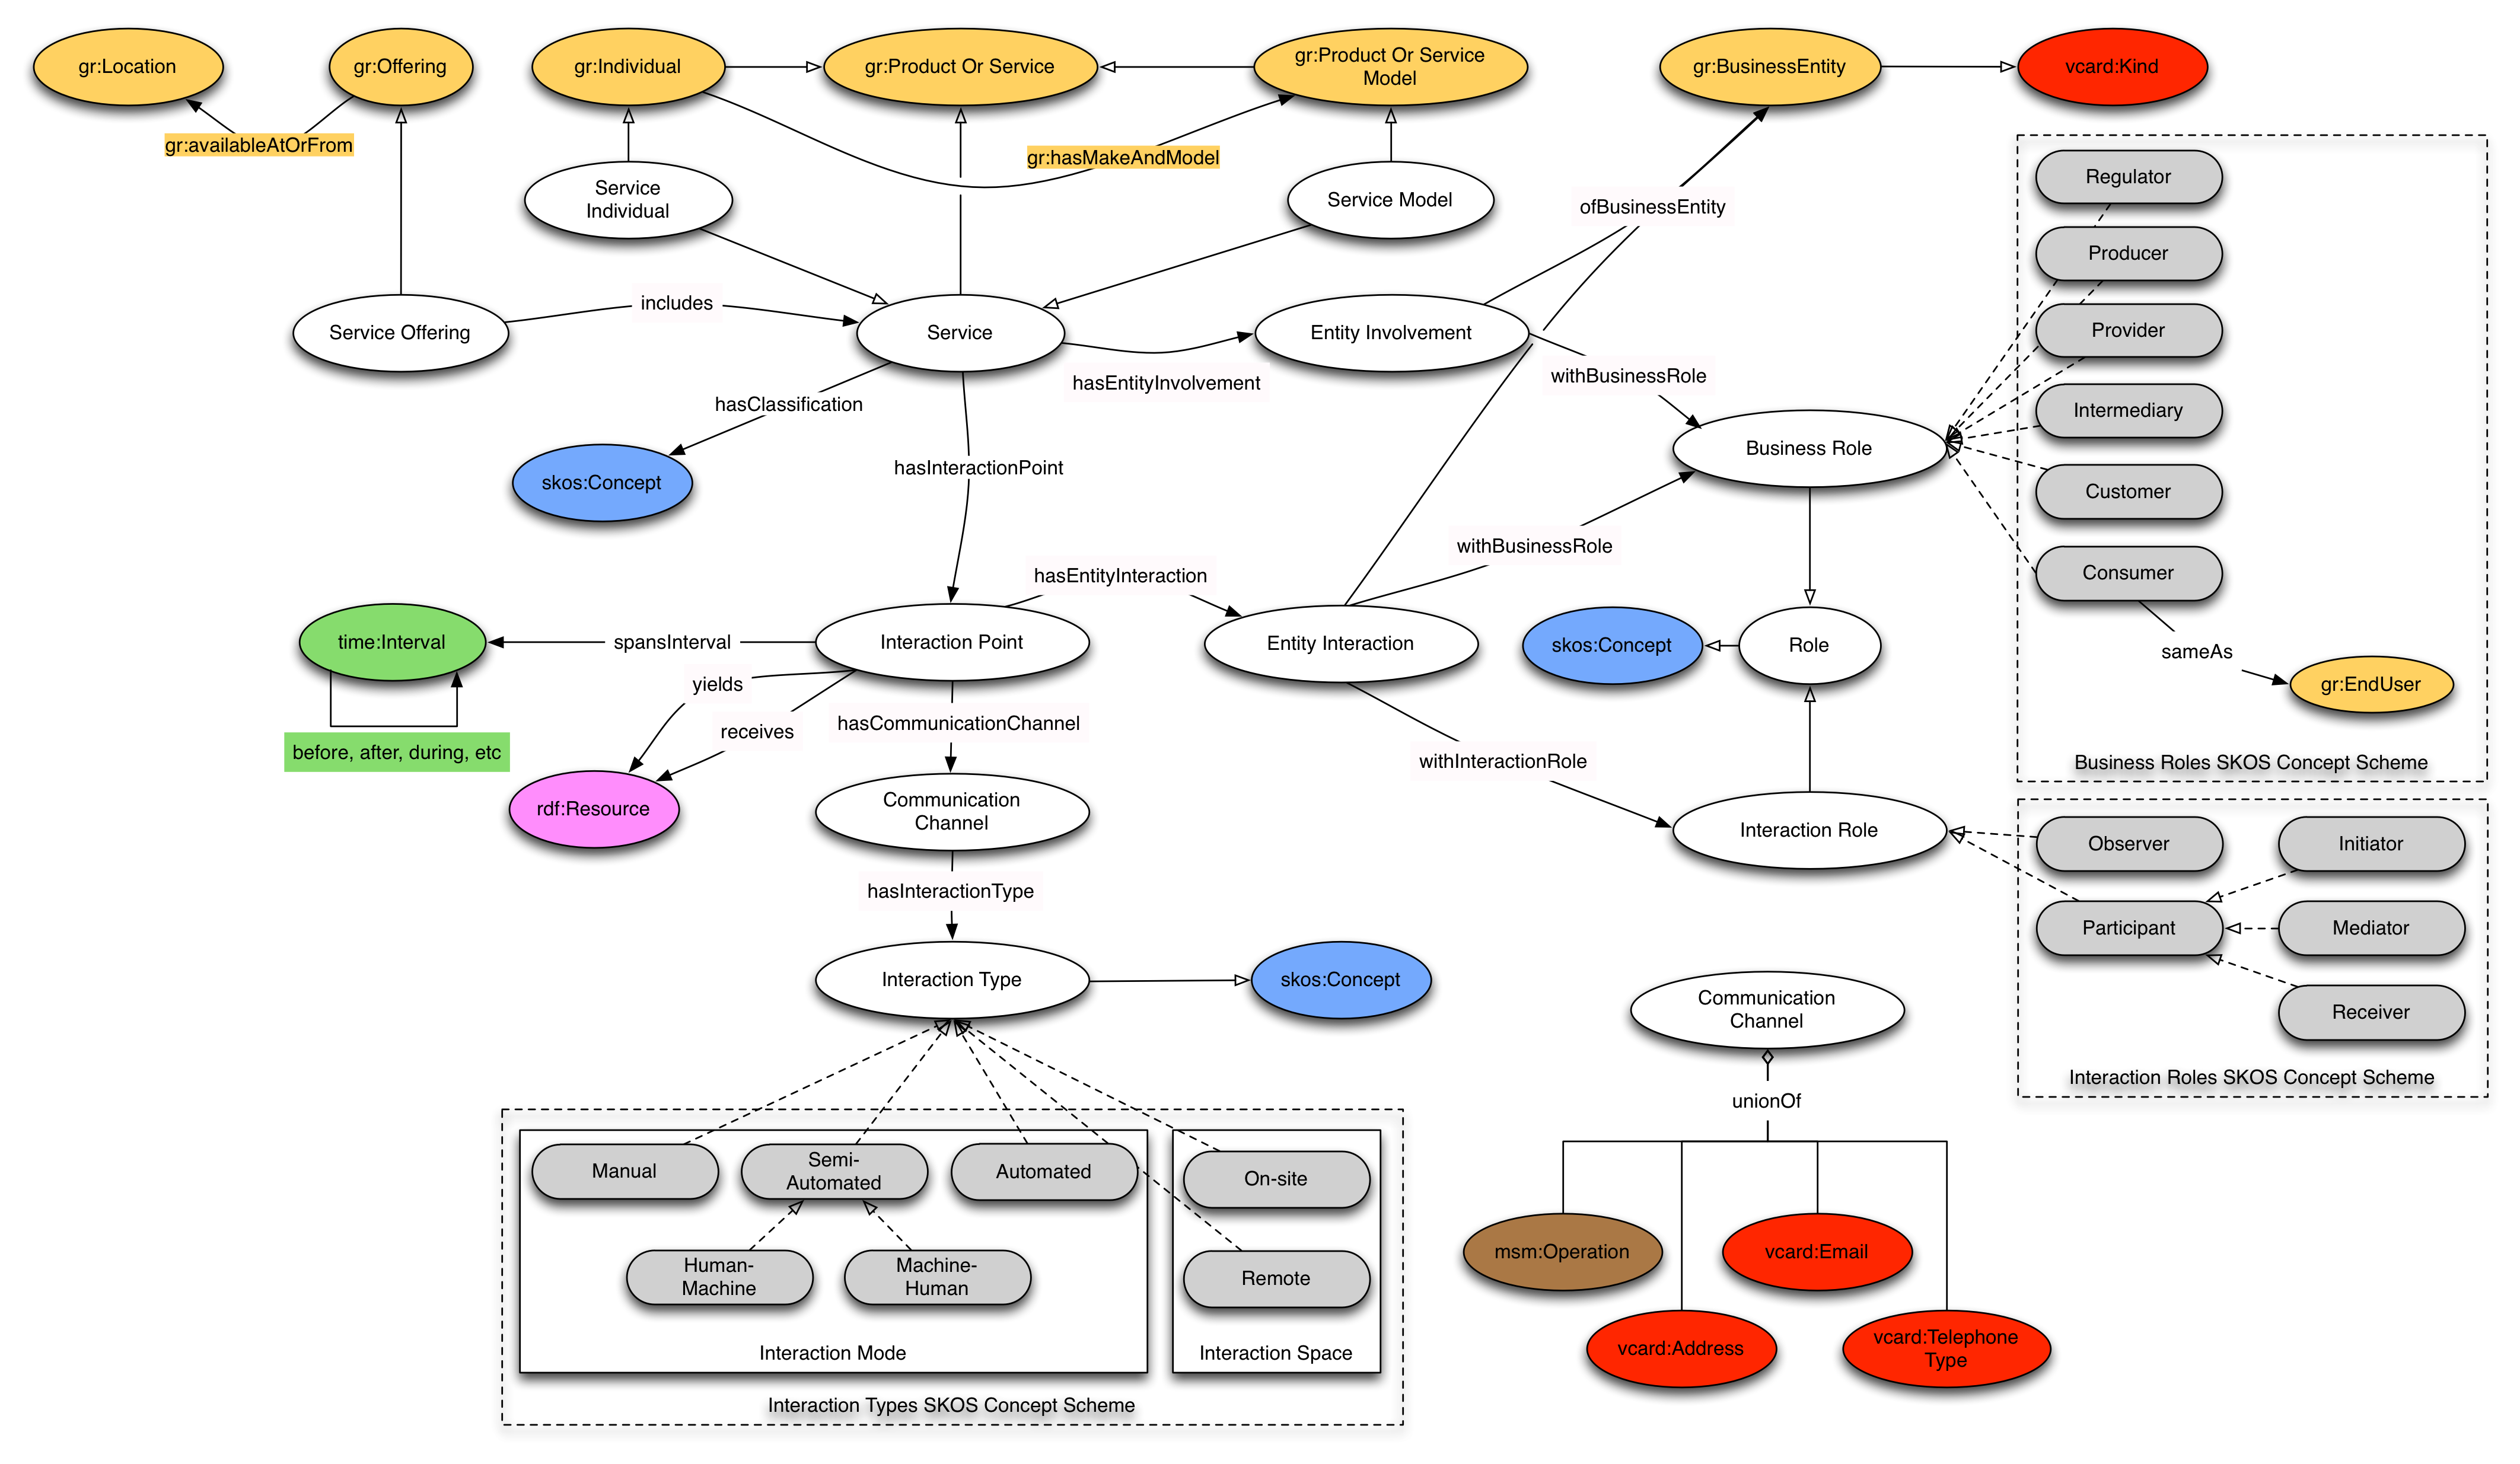 Linked USDL Core Schema